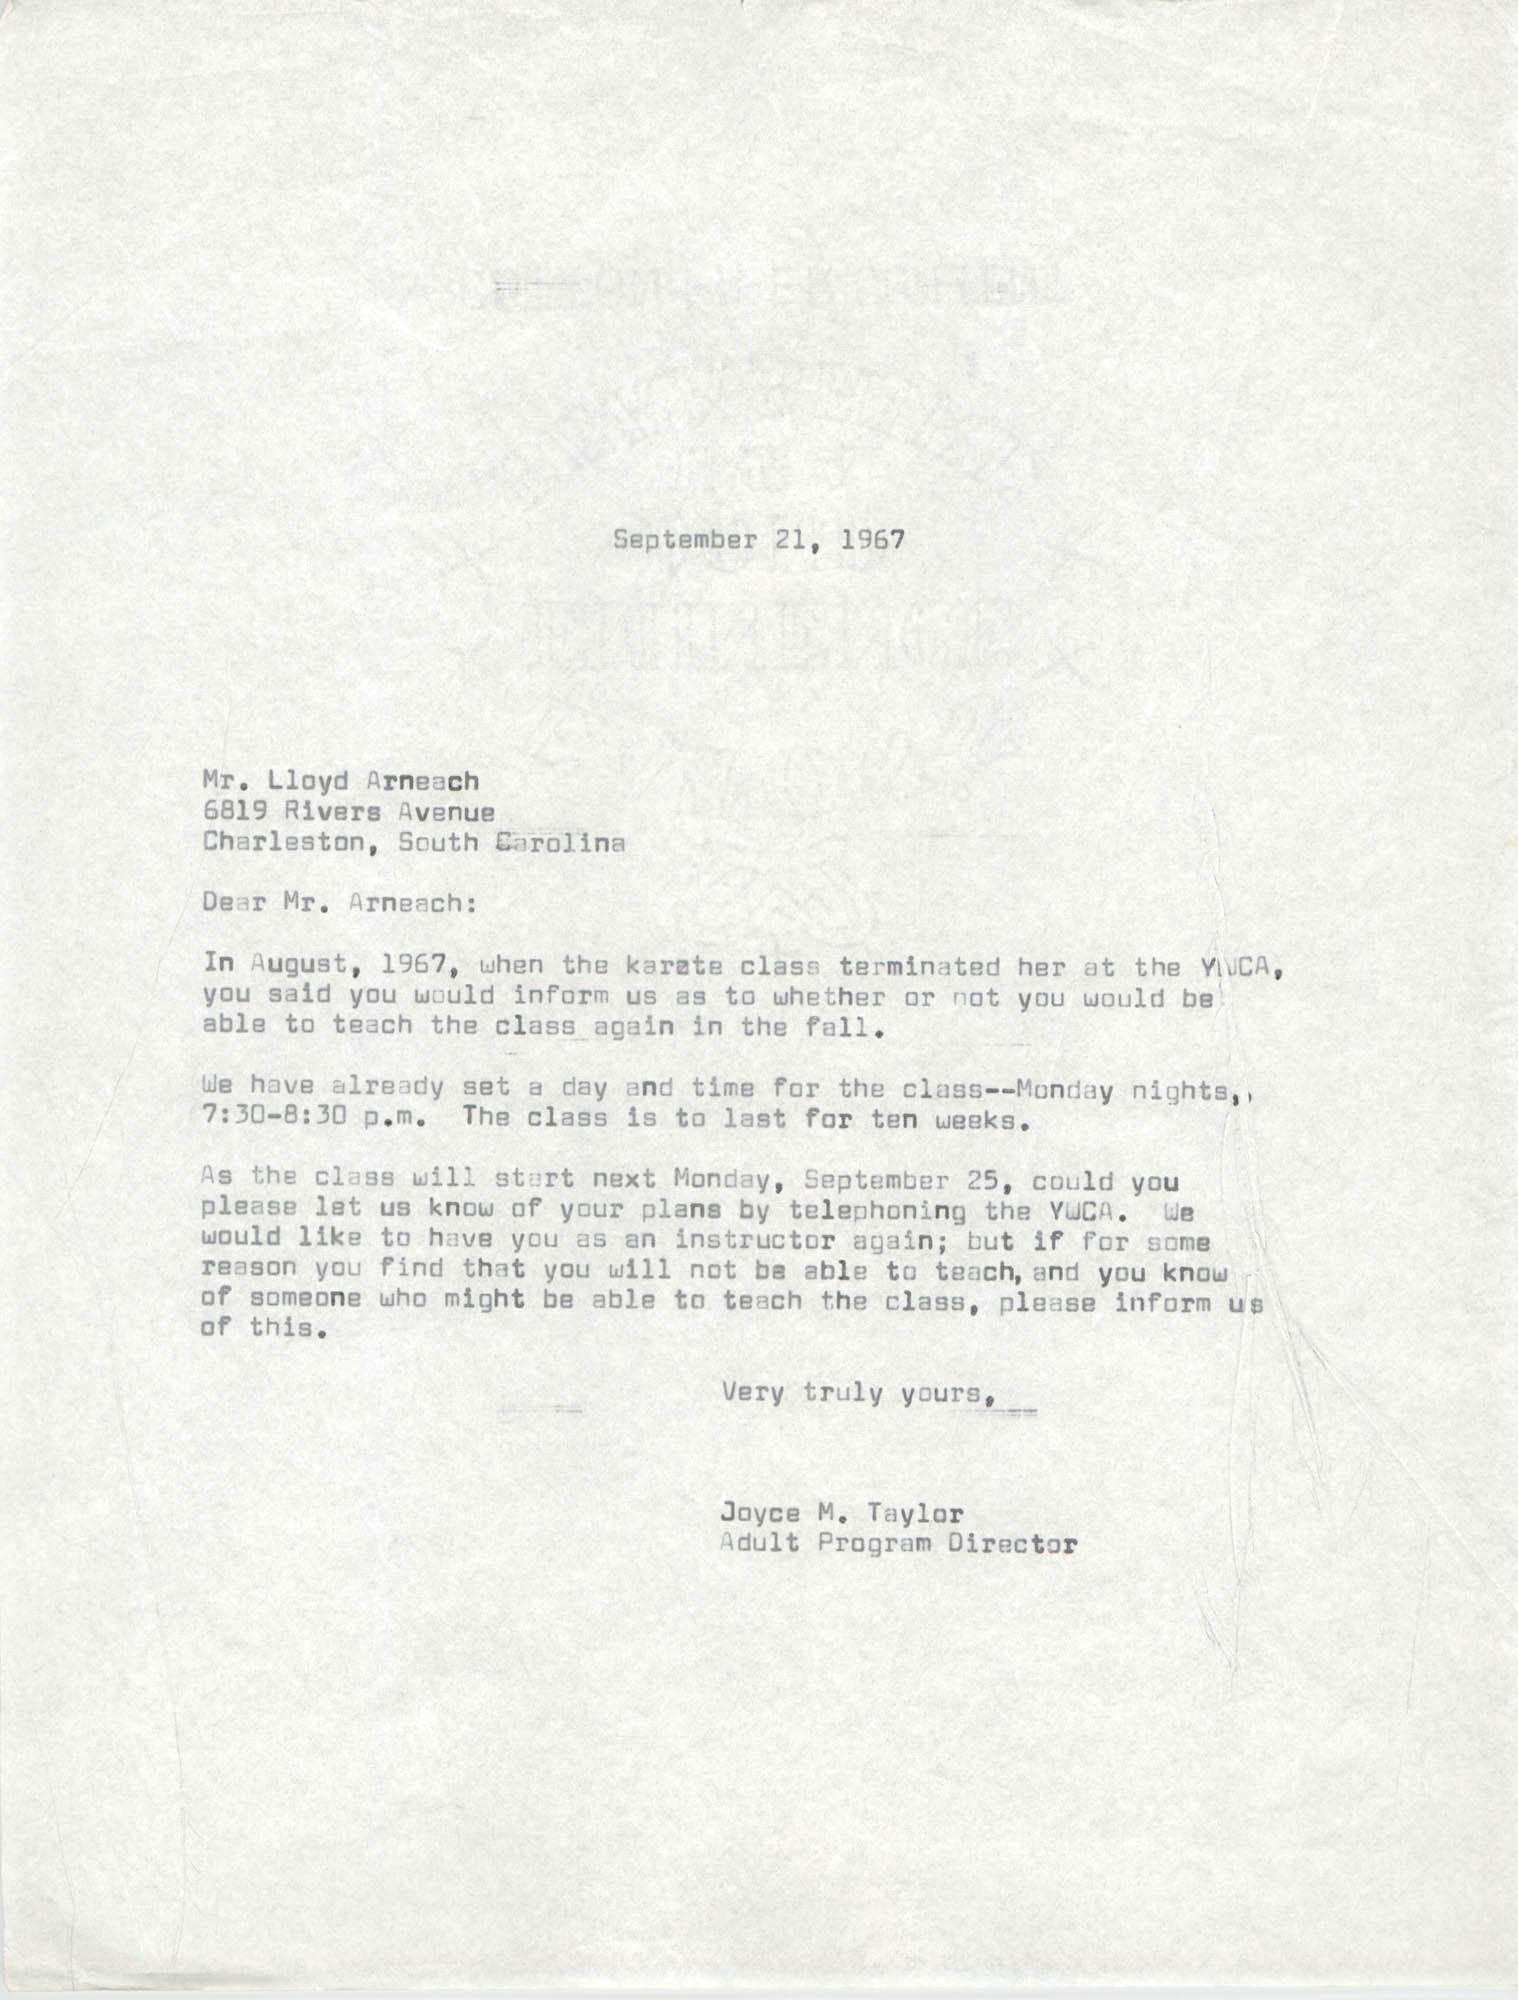 Letter from Joyce M. Taylor to Lloyd Arneach, September 21, 1967